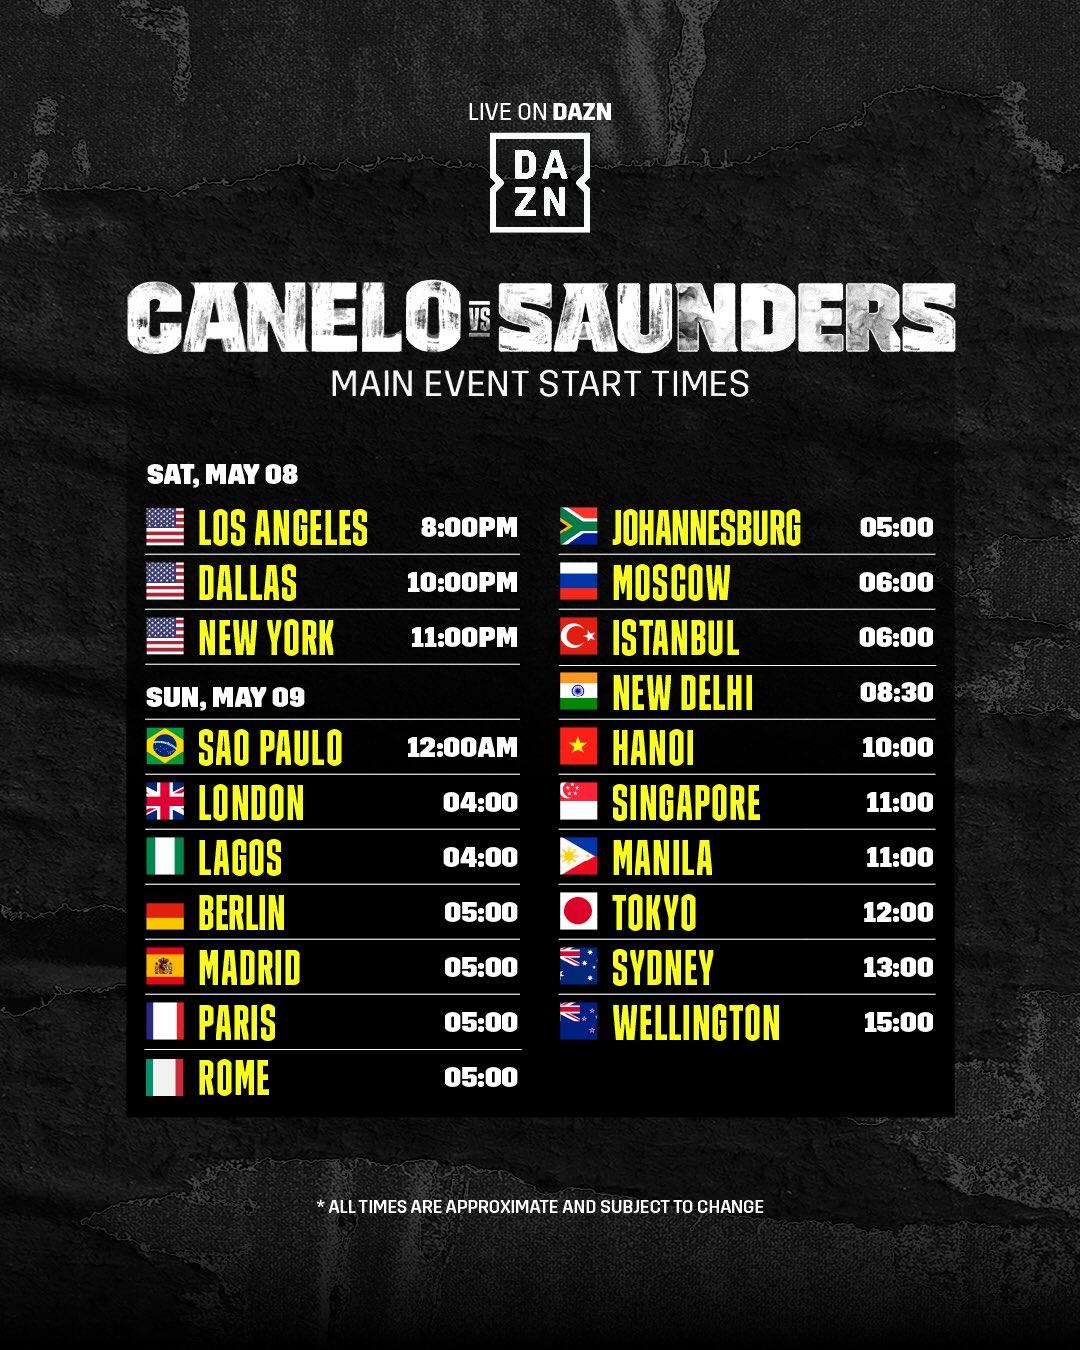 canelo-saunders-main-event-start-times-dazn